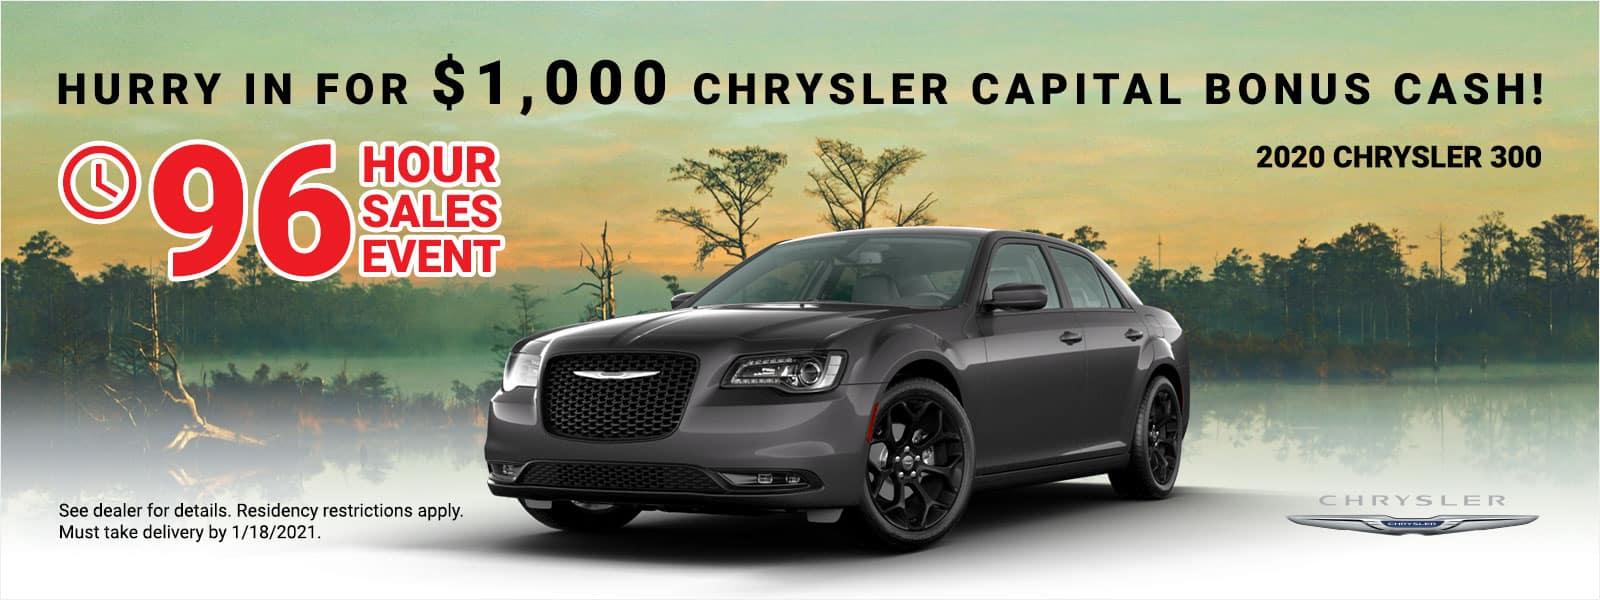 SEBC_Banners_1600x600_2021-01_517961_2020-Chrysler-300